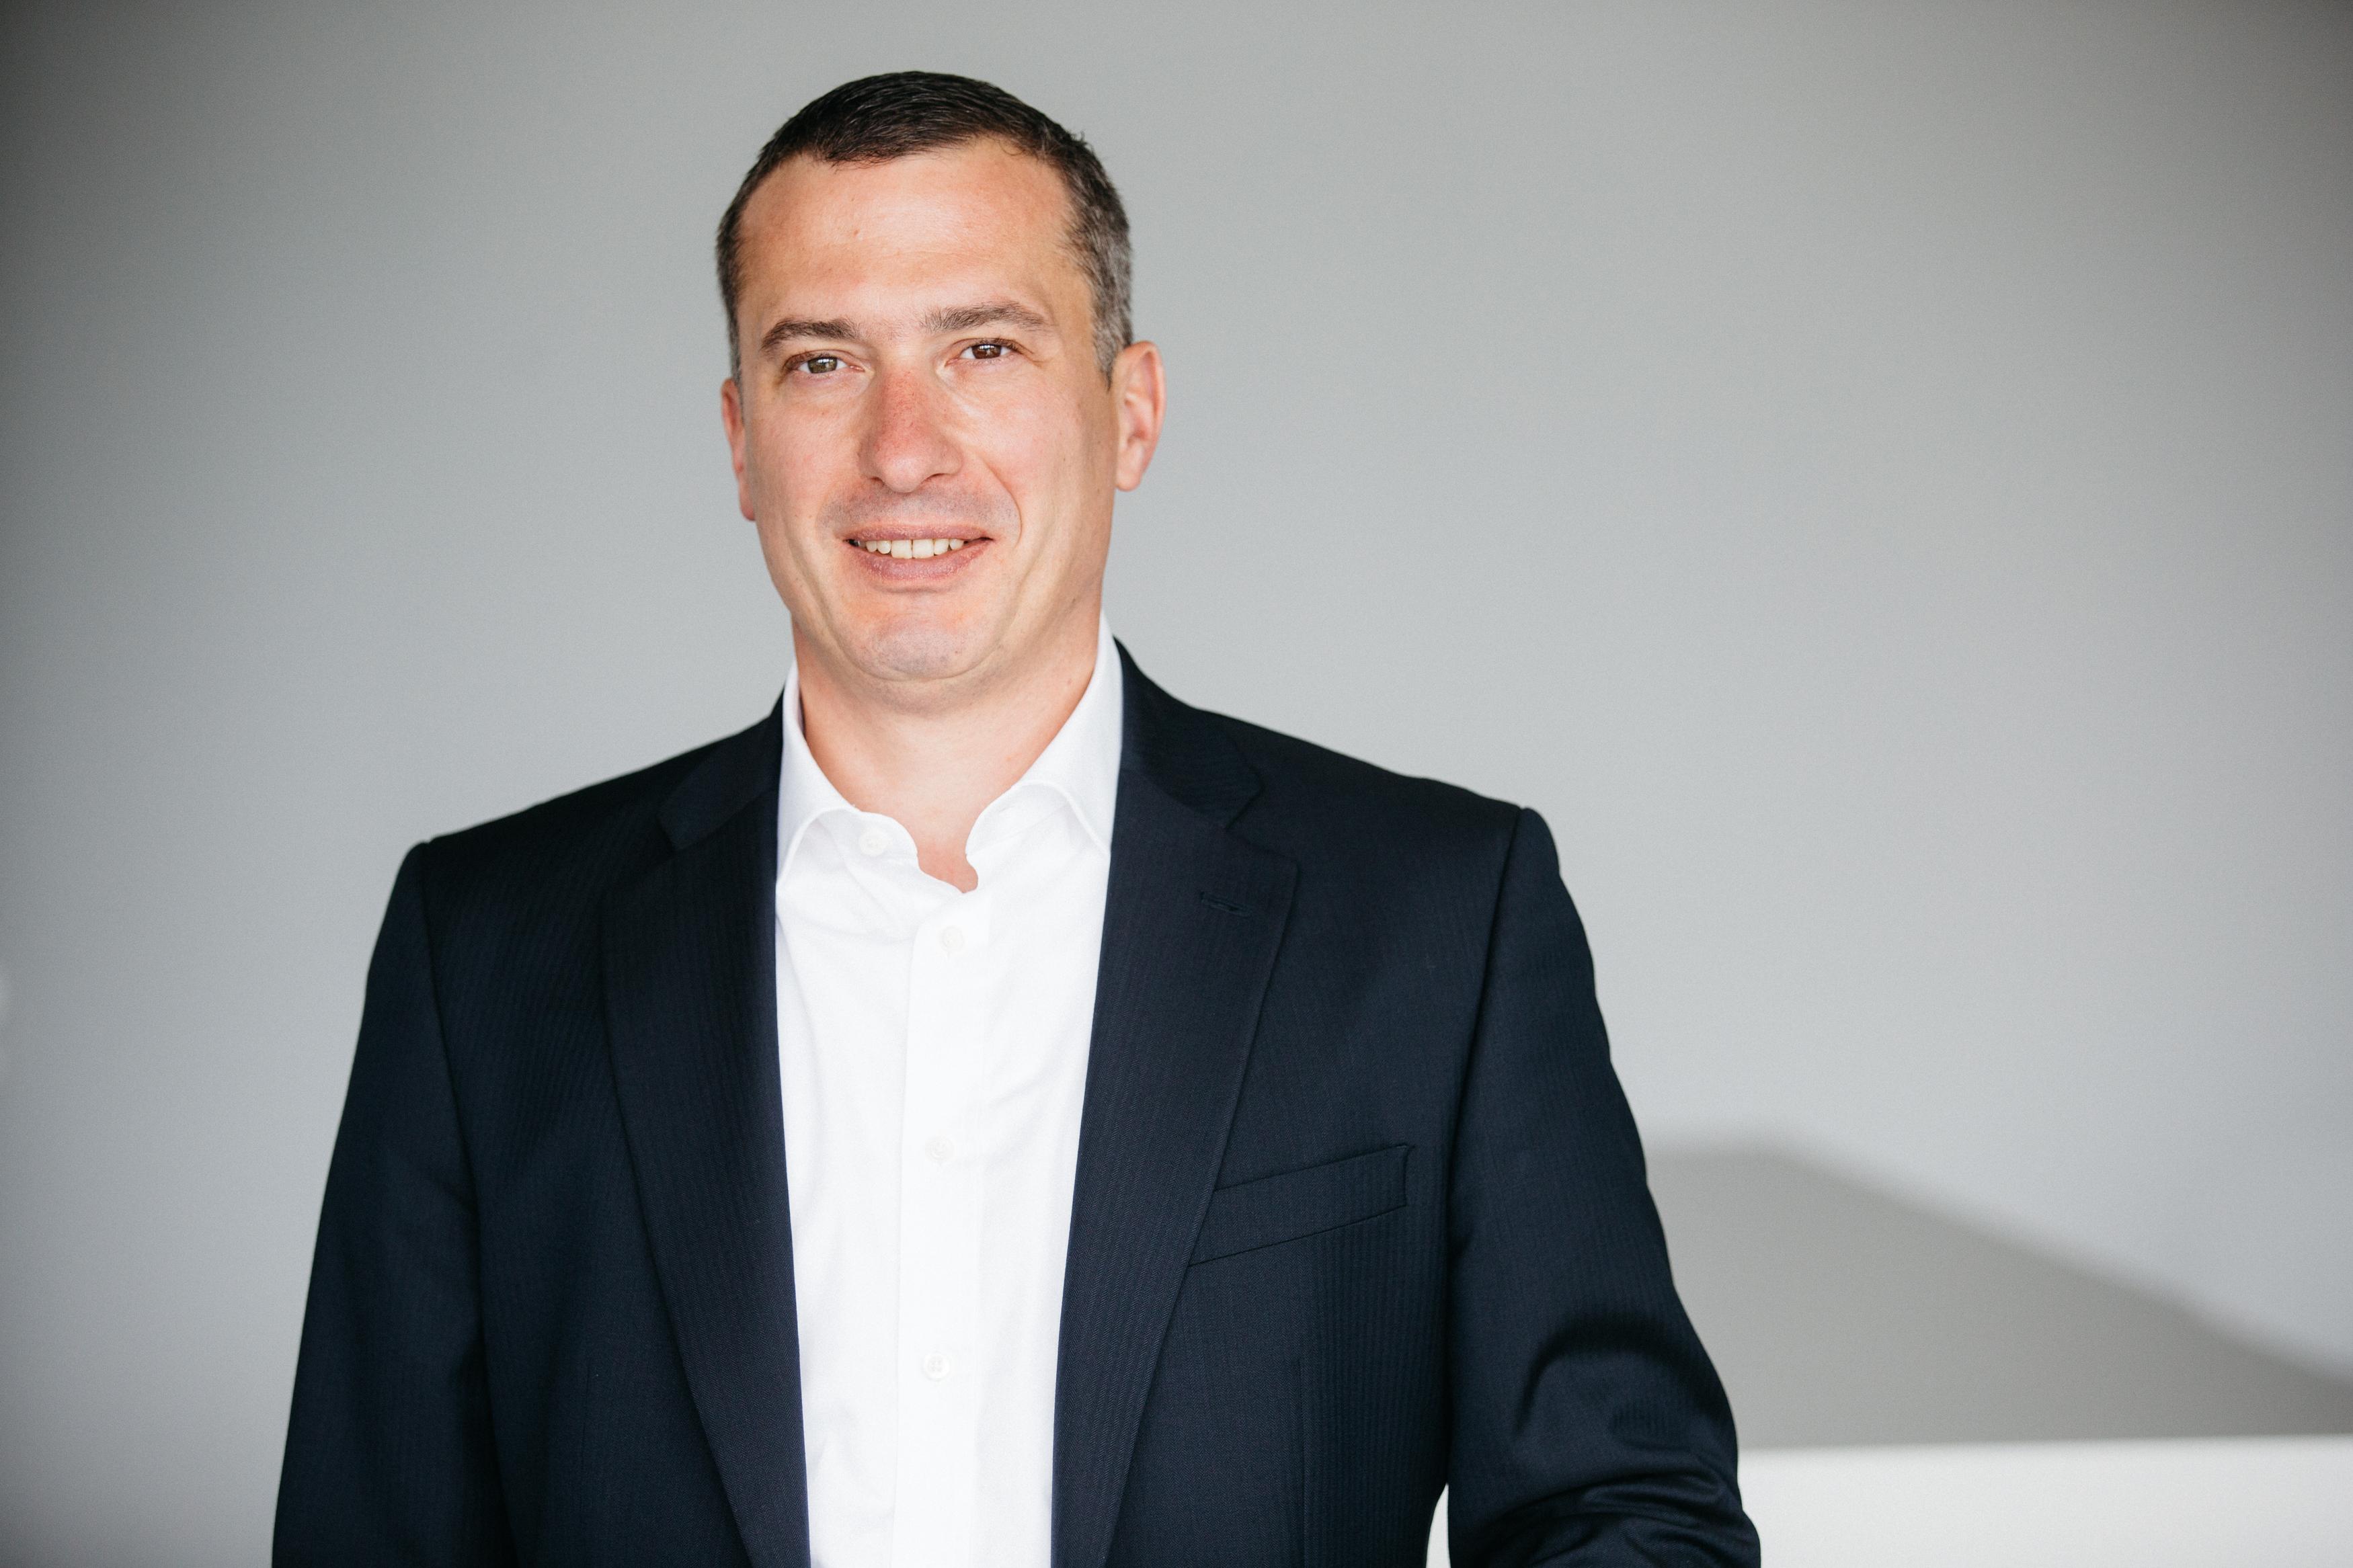 Prof. Dr. Peter Ruhwedel